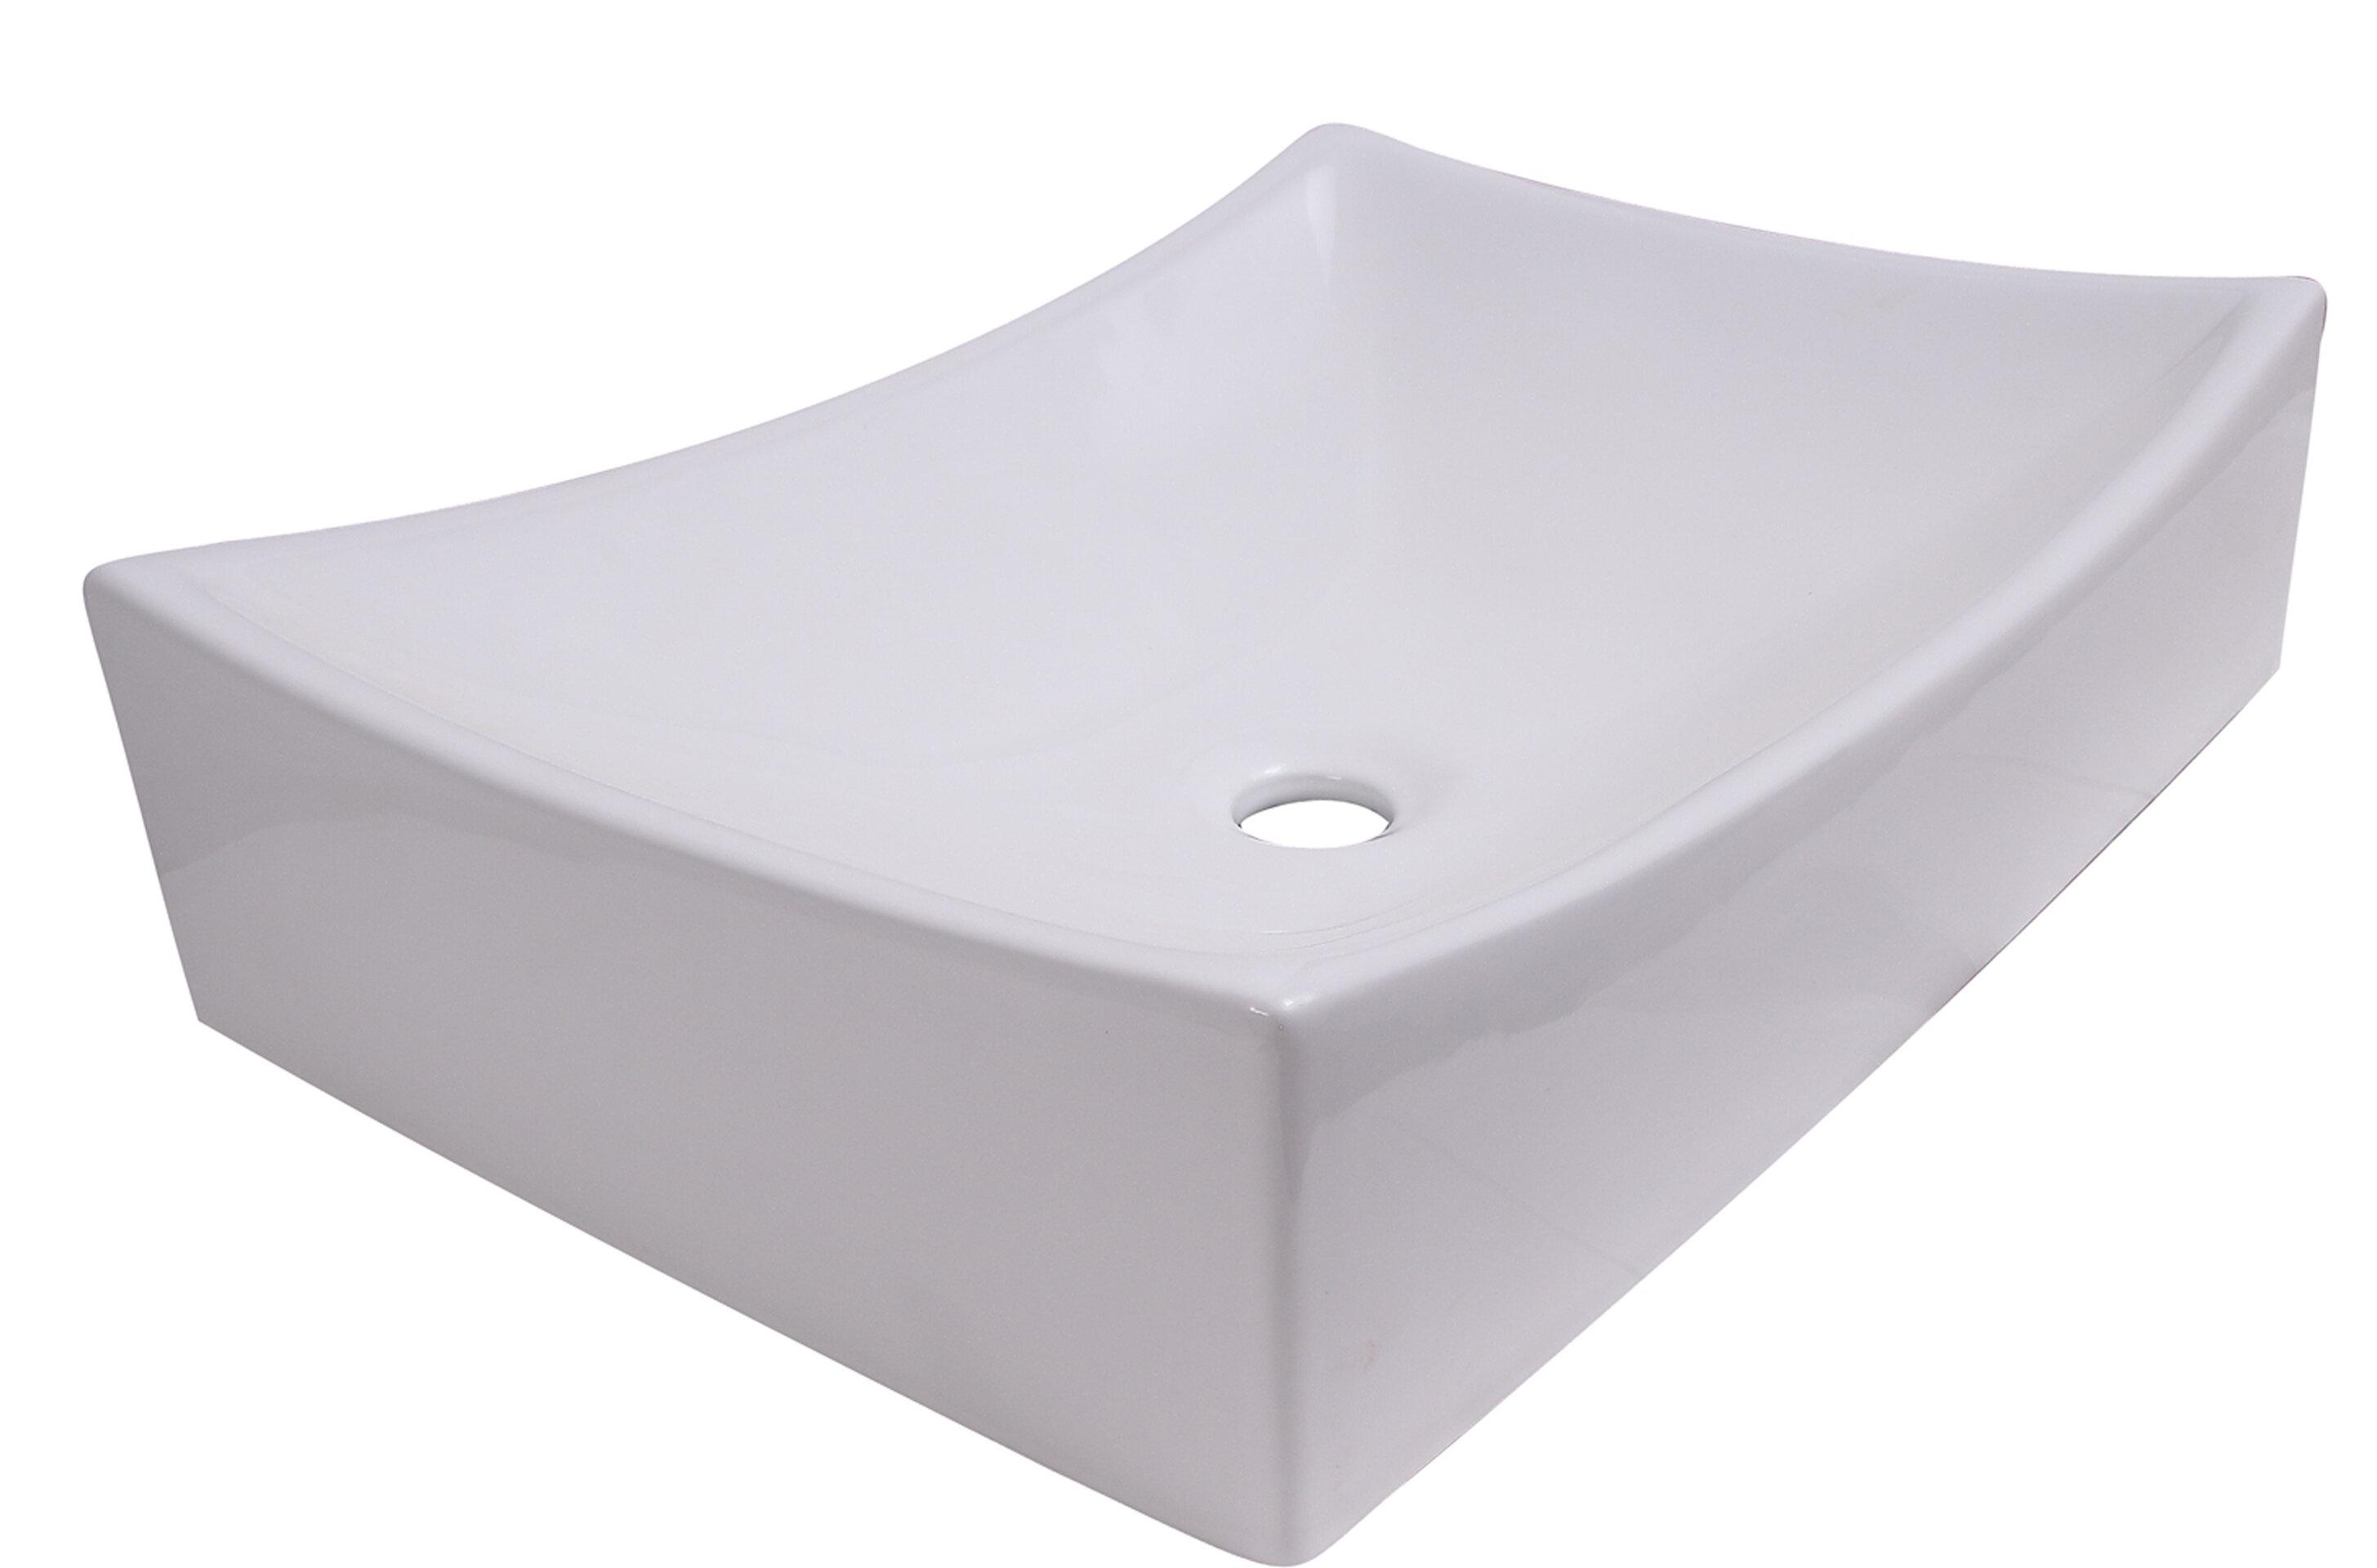 Barclay Styx Vitreous China Rectangular Vessel Bathroom Sink Wayfair